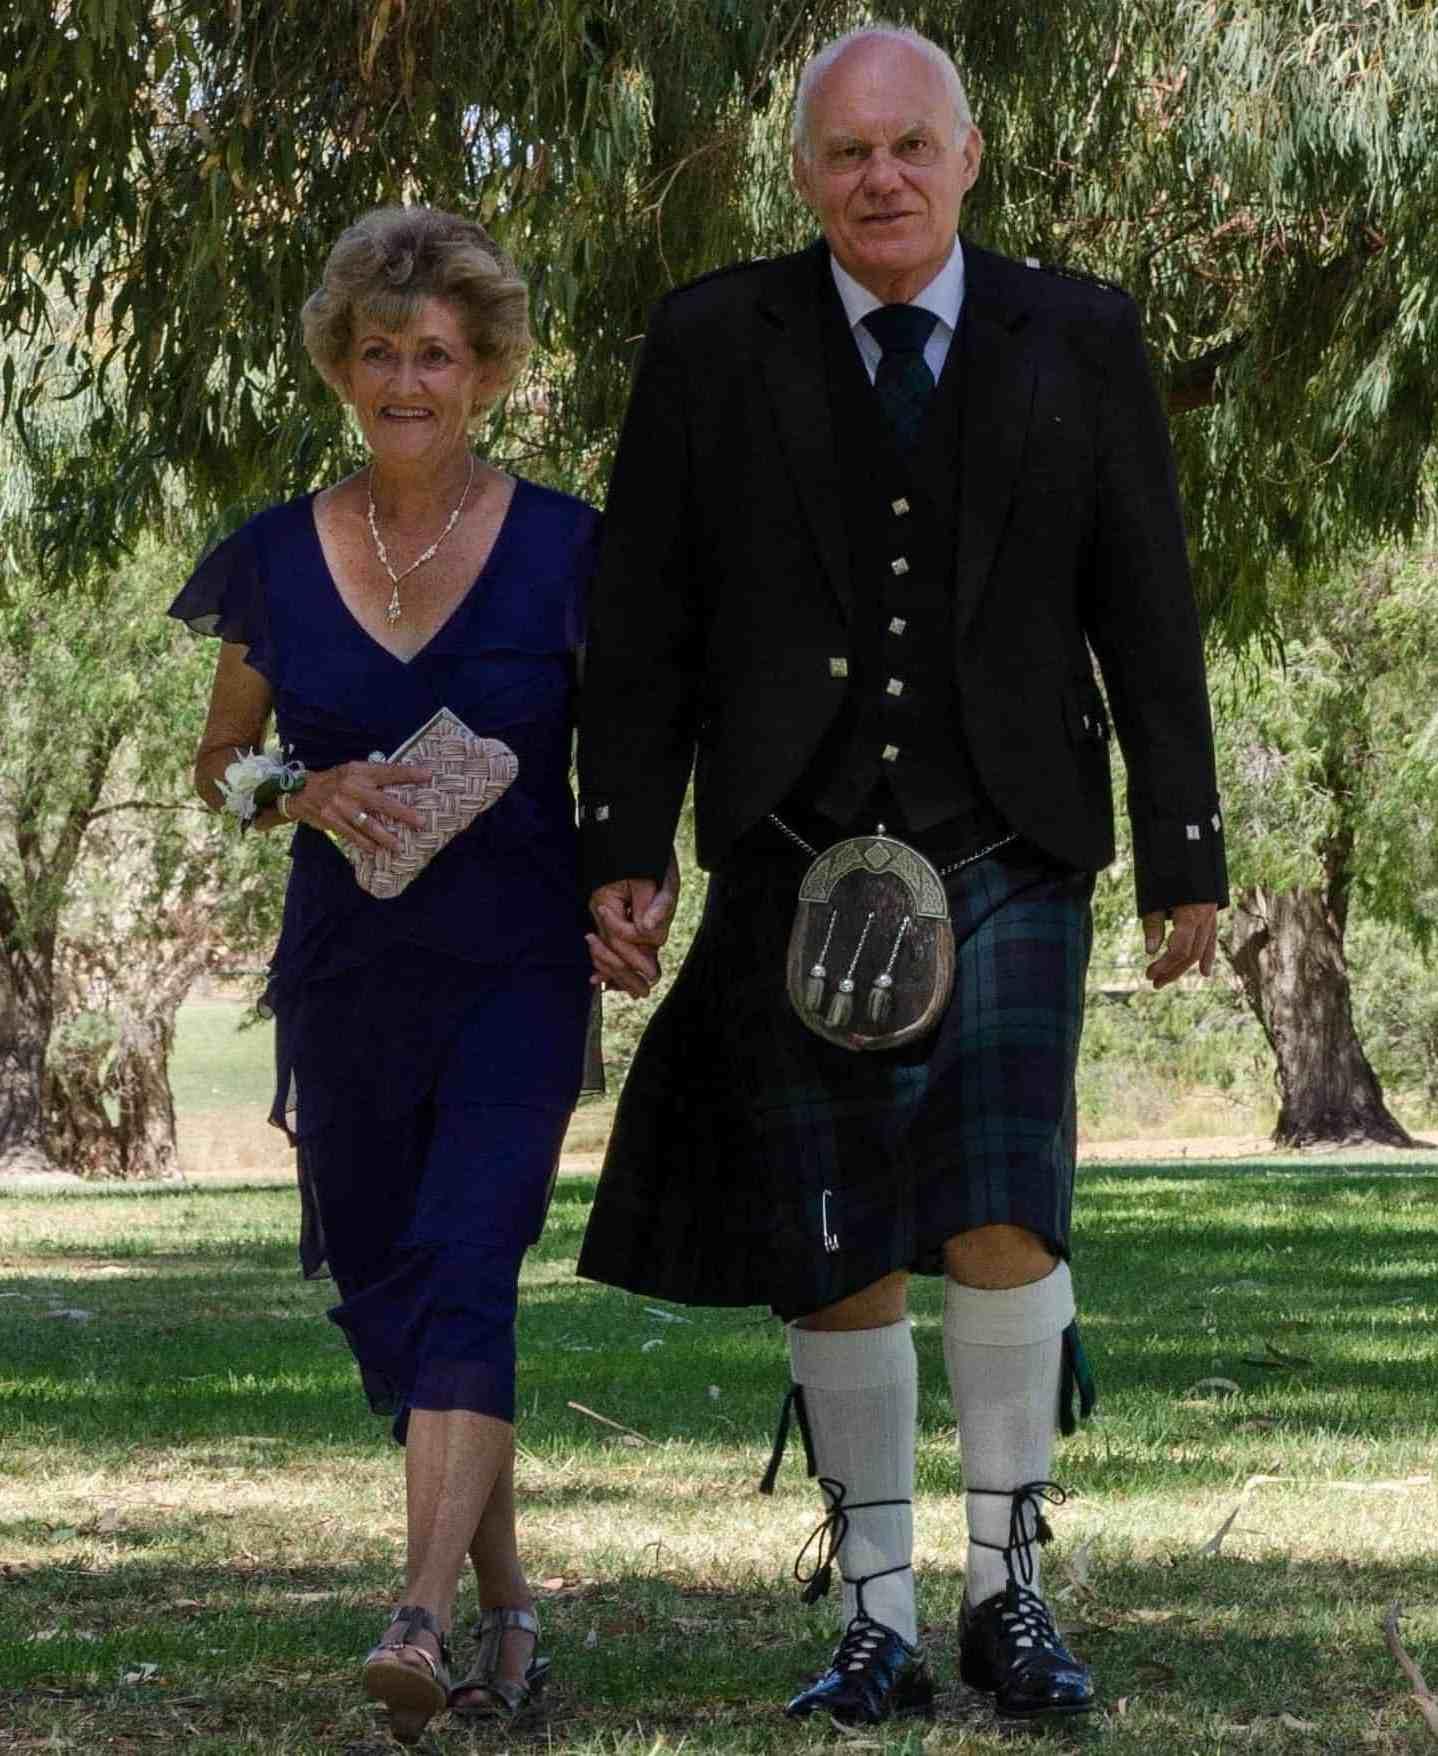 Donna Rynne marriage to John Boyle